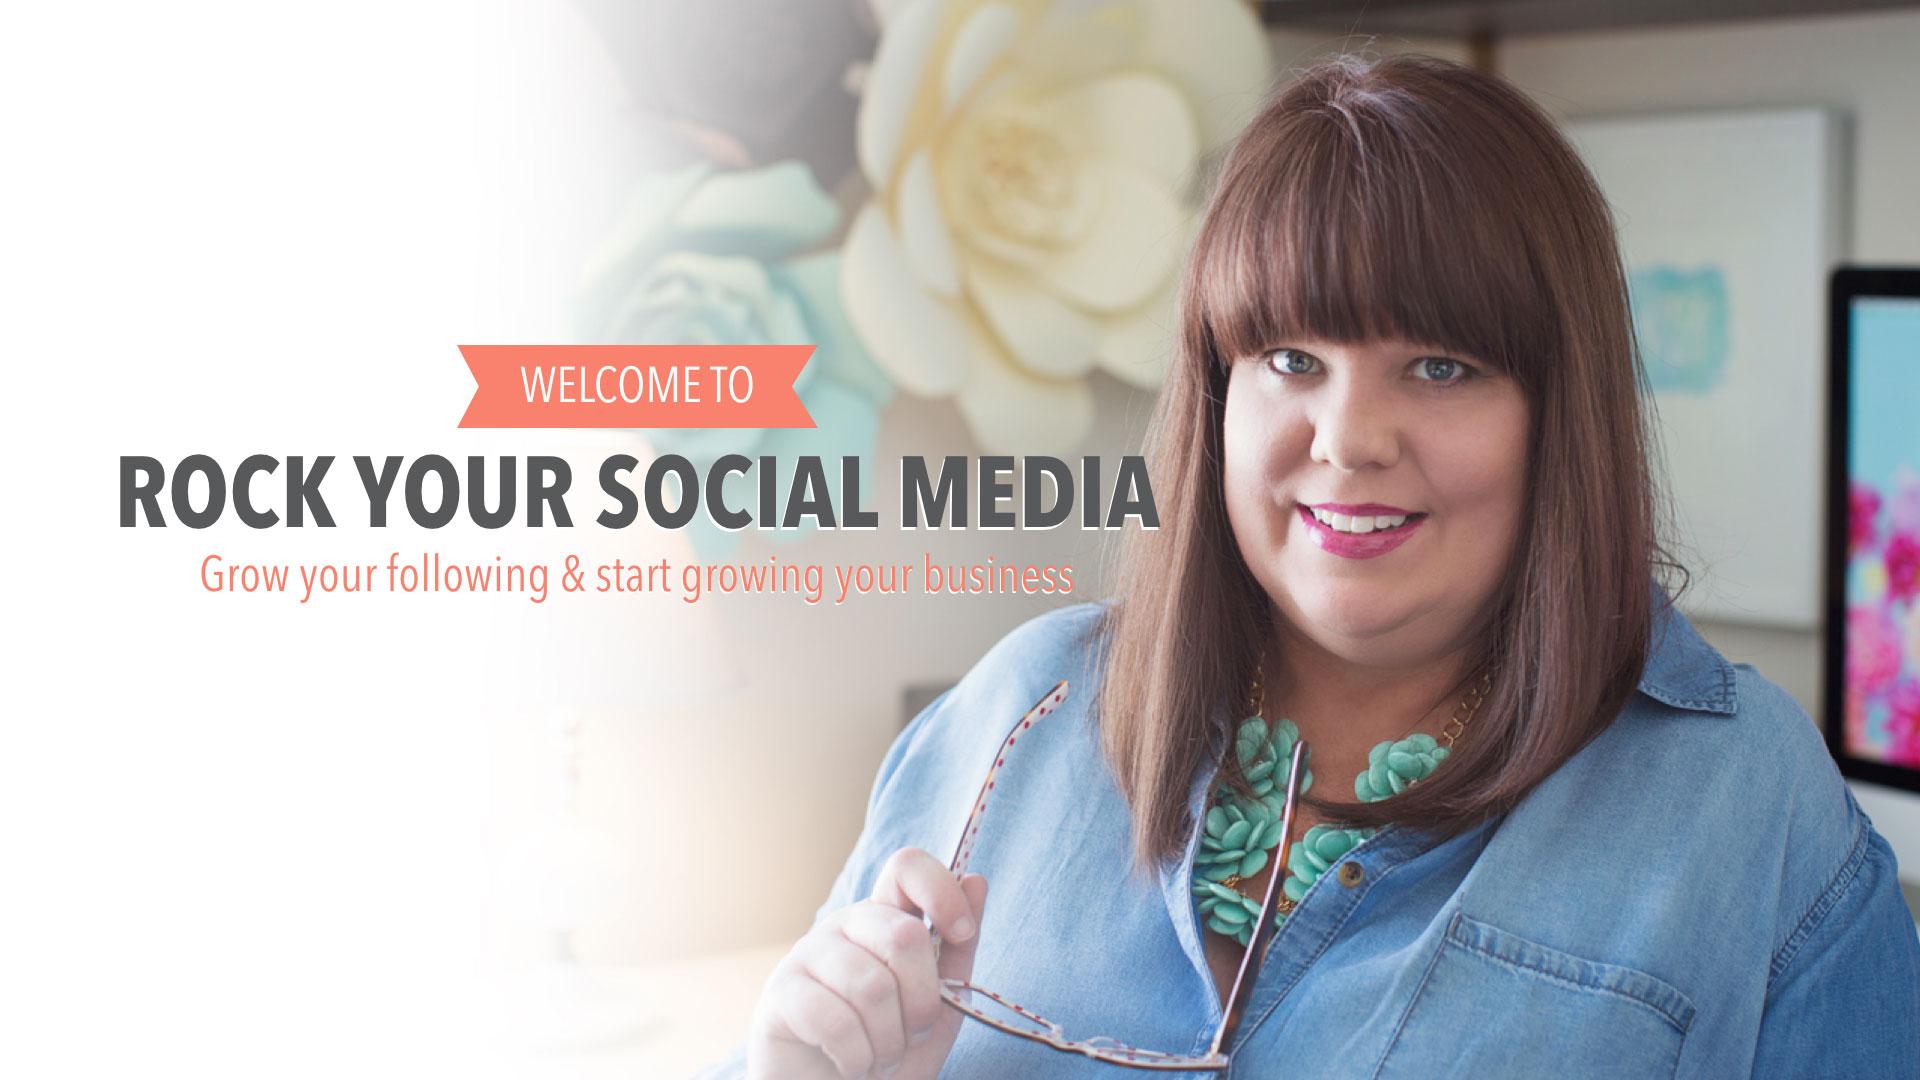 Rock Your Social Media